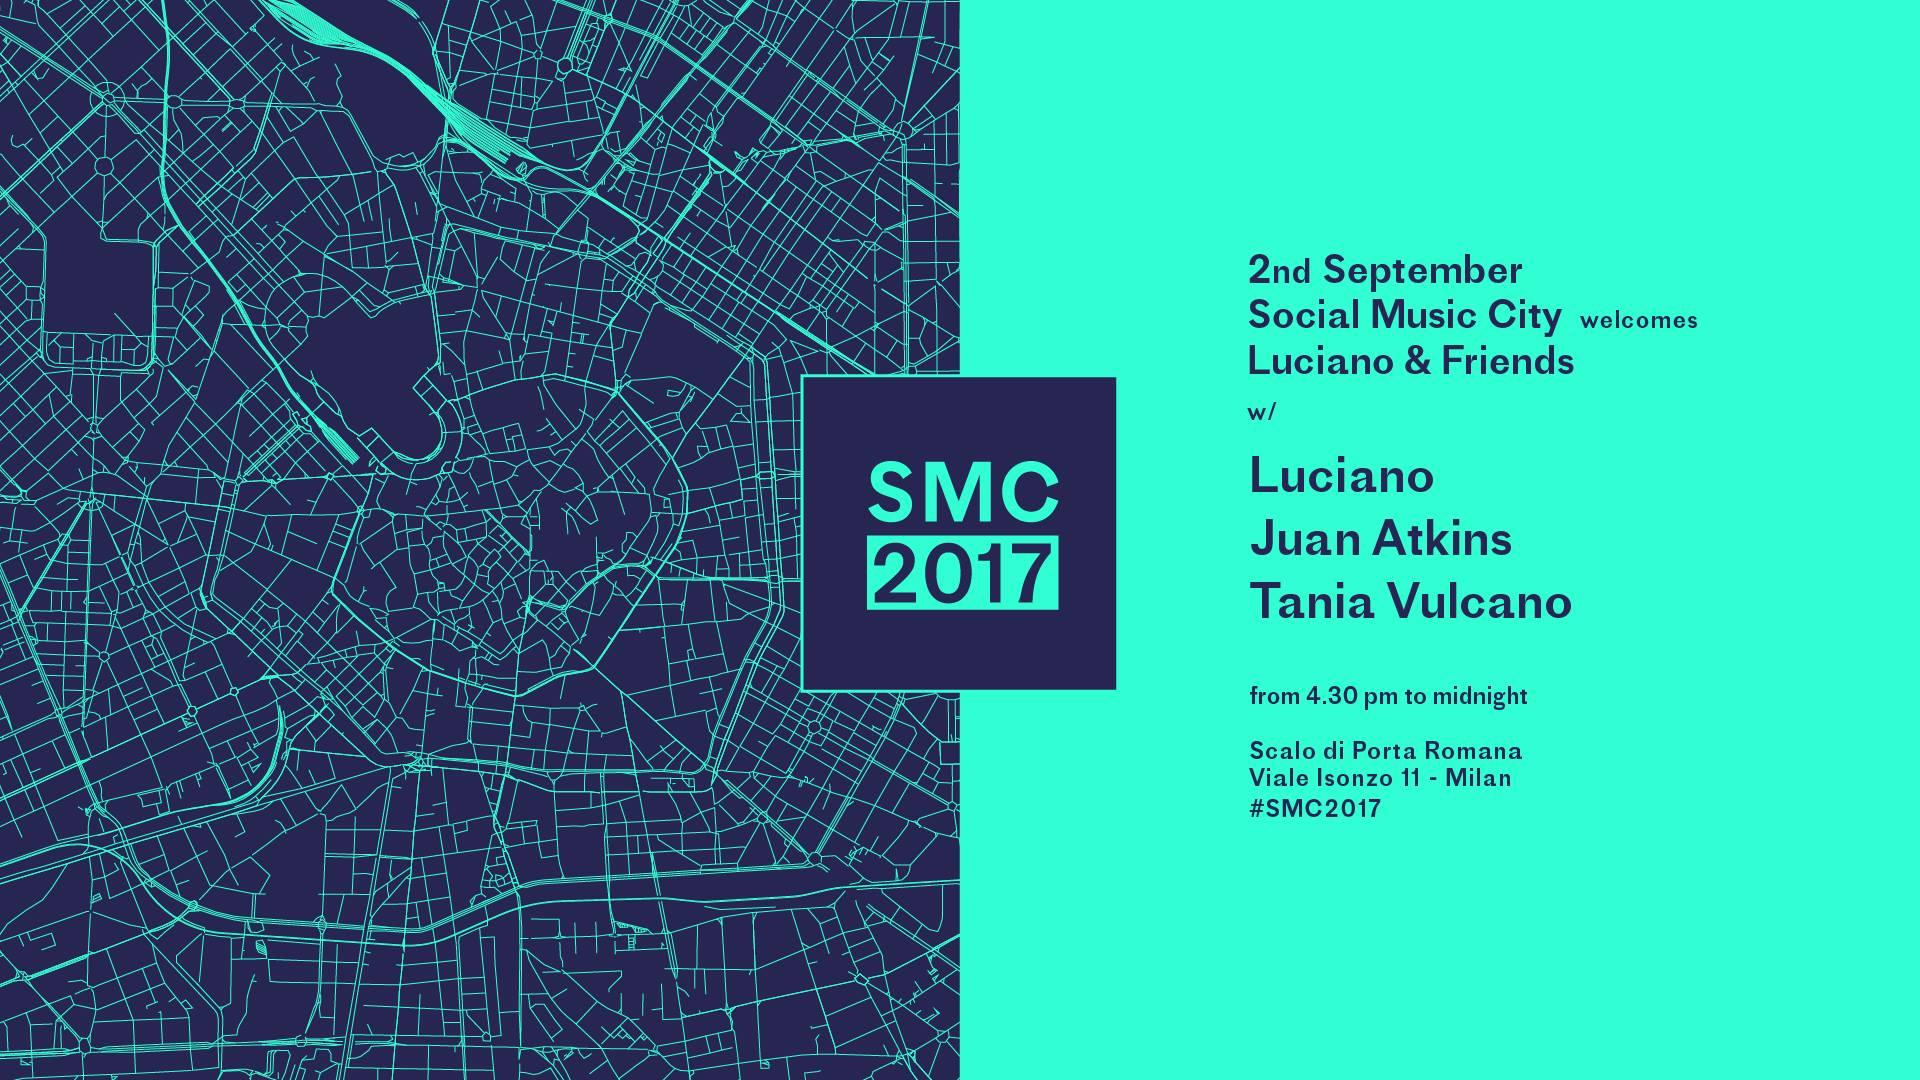 LUCIANO SOCIAL MUSIC CITY 02 09 2017